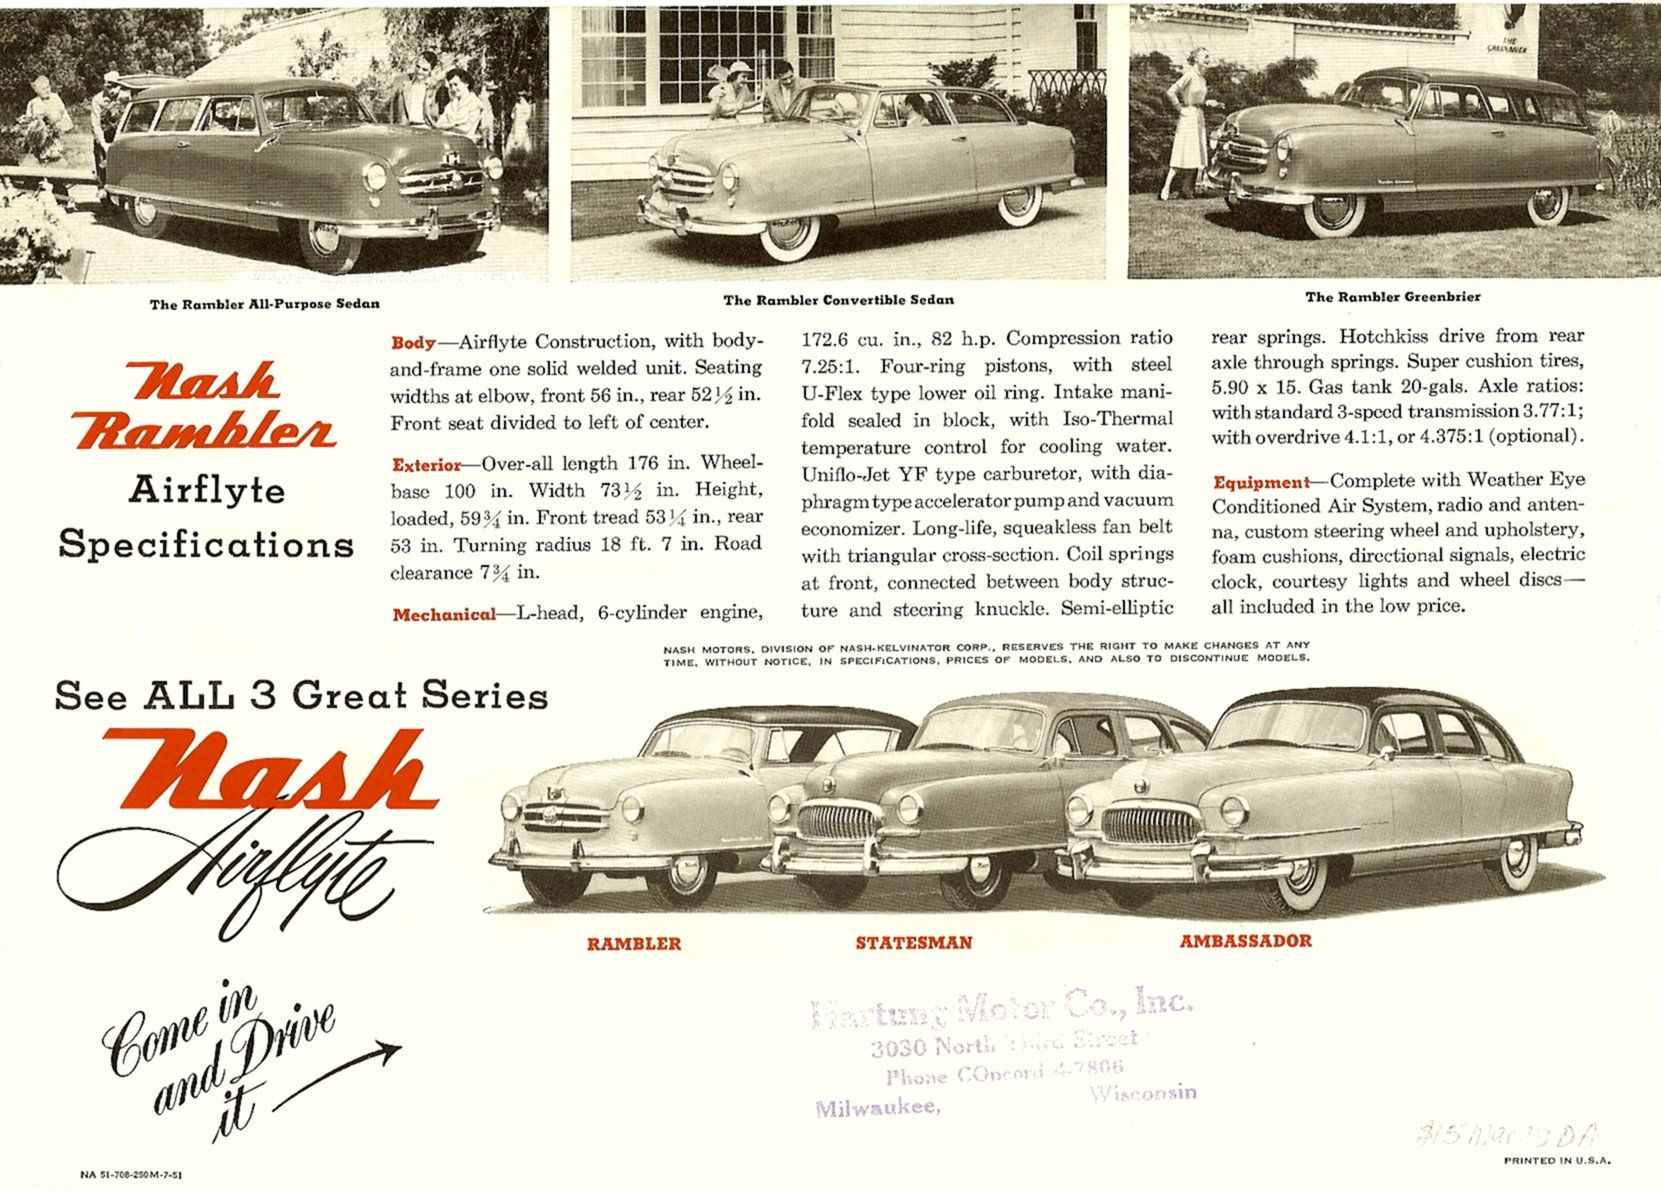 1954 Nash Rambler | Nash Rambler Country Club: Photos, Reviews, News ...